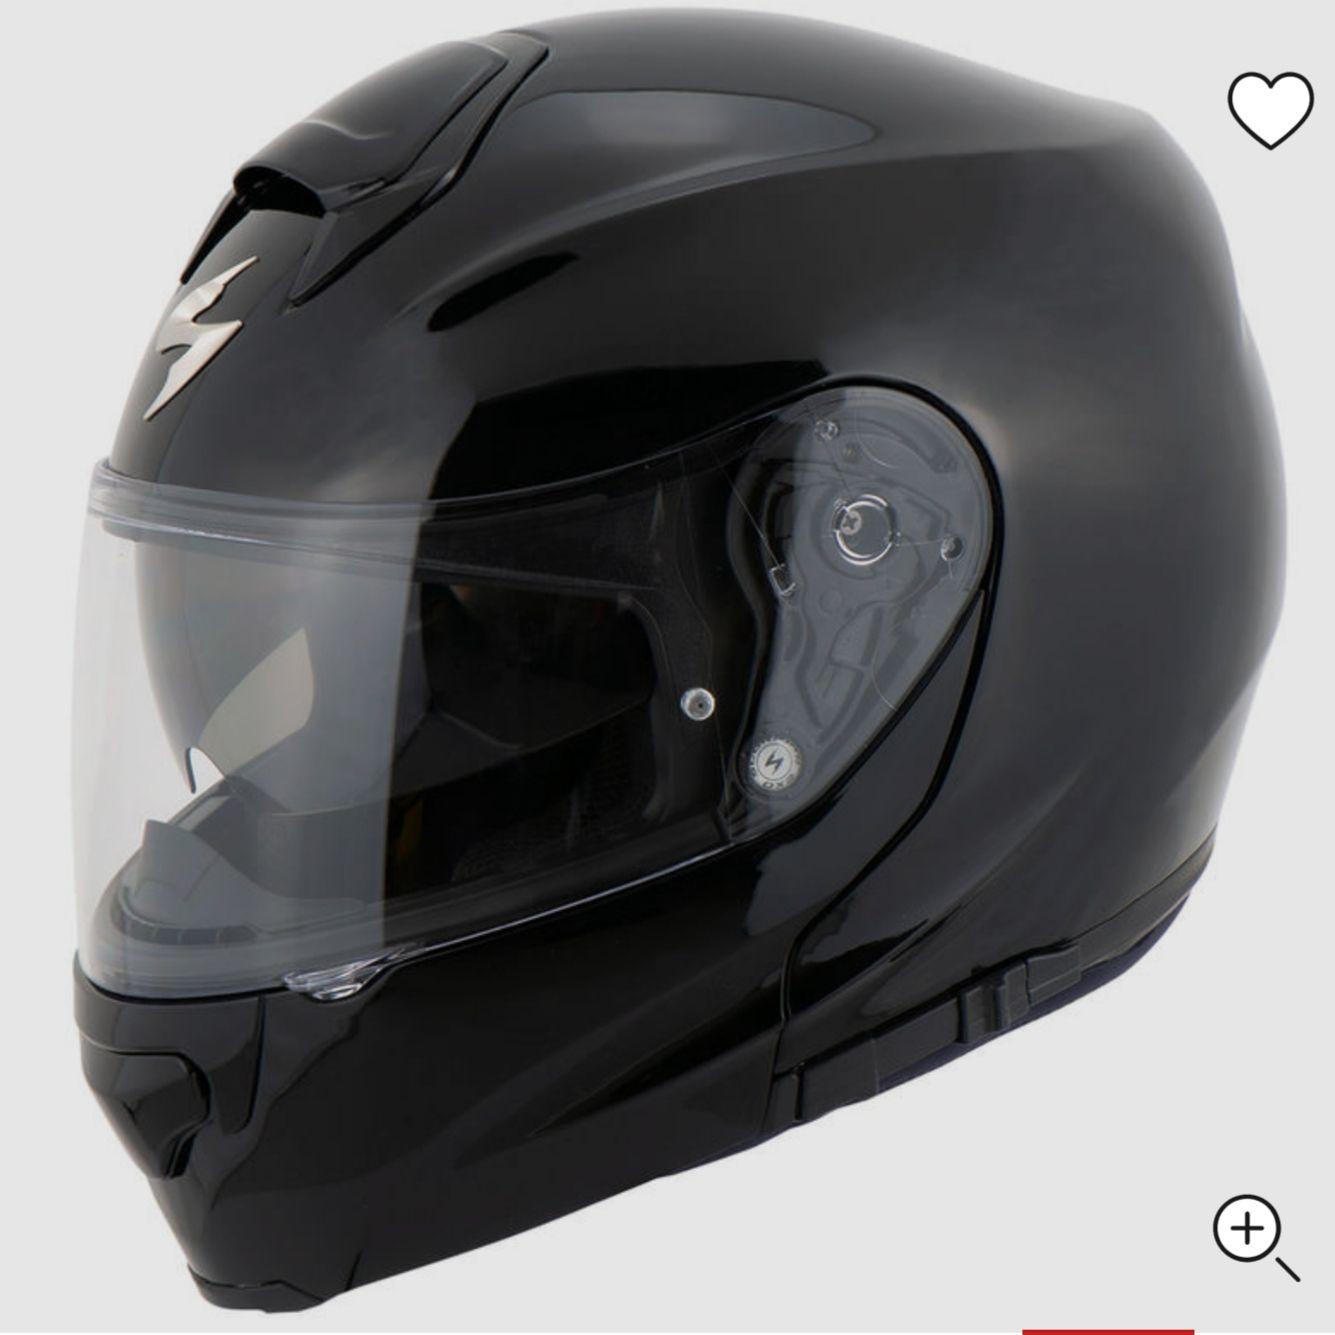 Casque moto intégral Scorpion Exo-3000 Air - Du S au XL